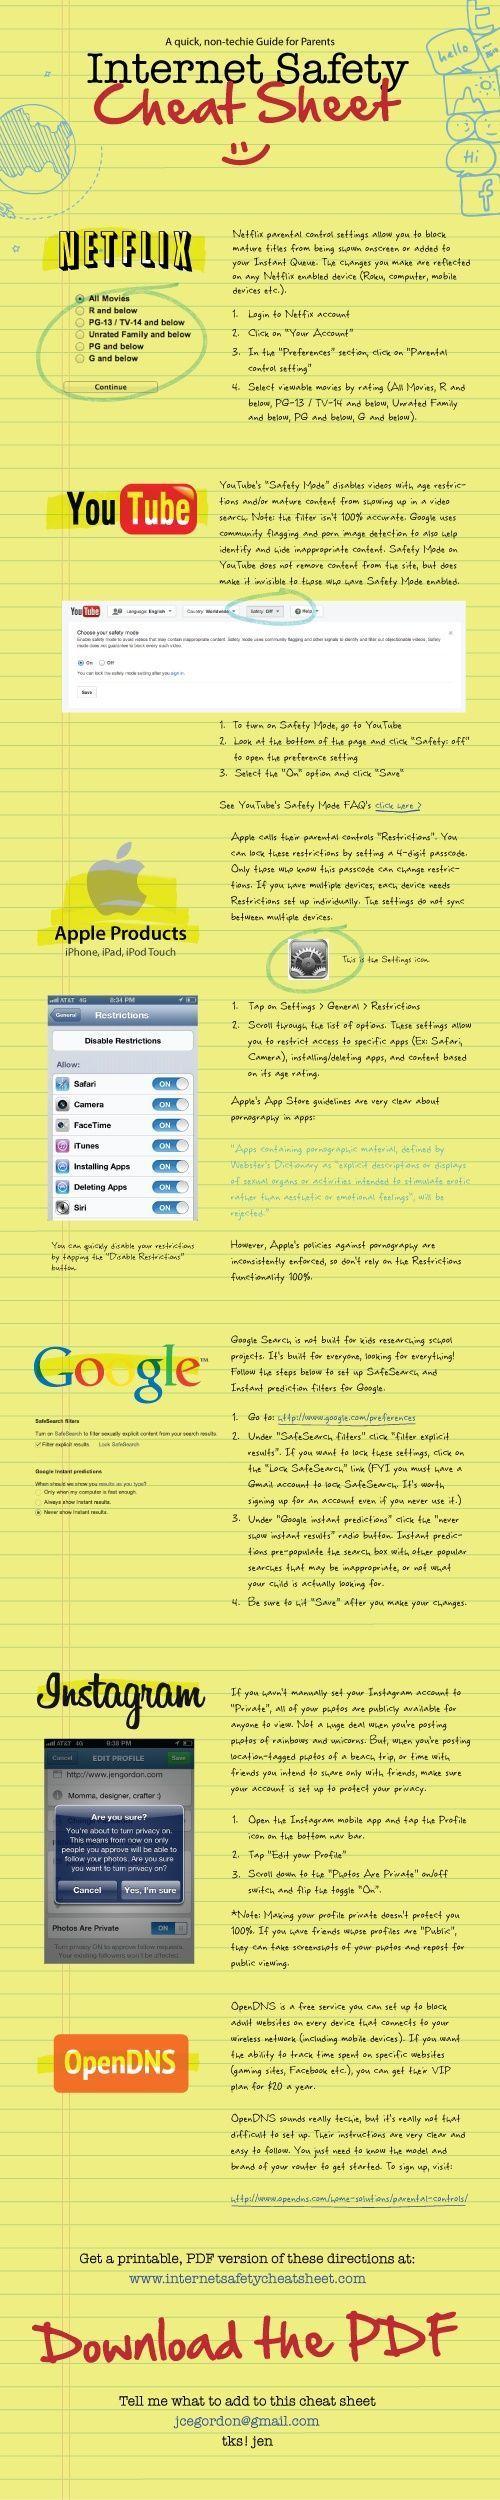 internet safety cheat sheet